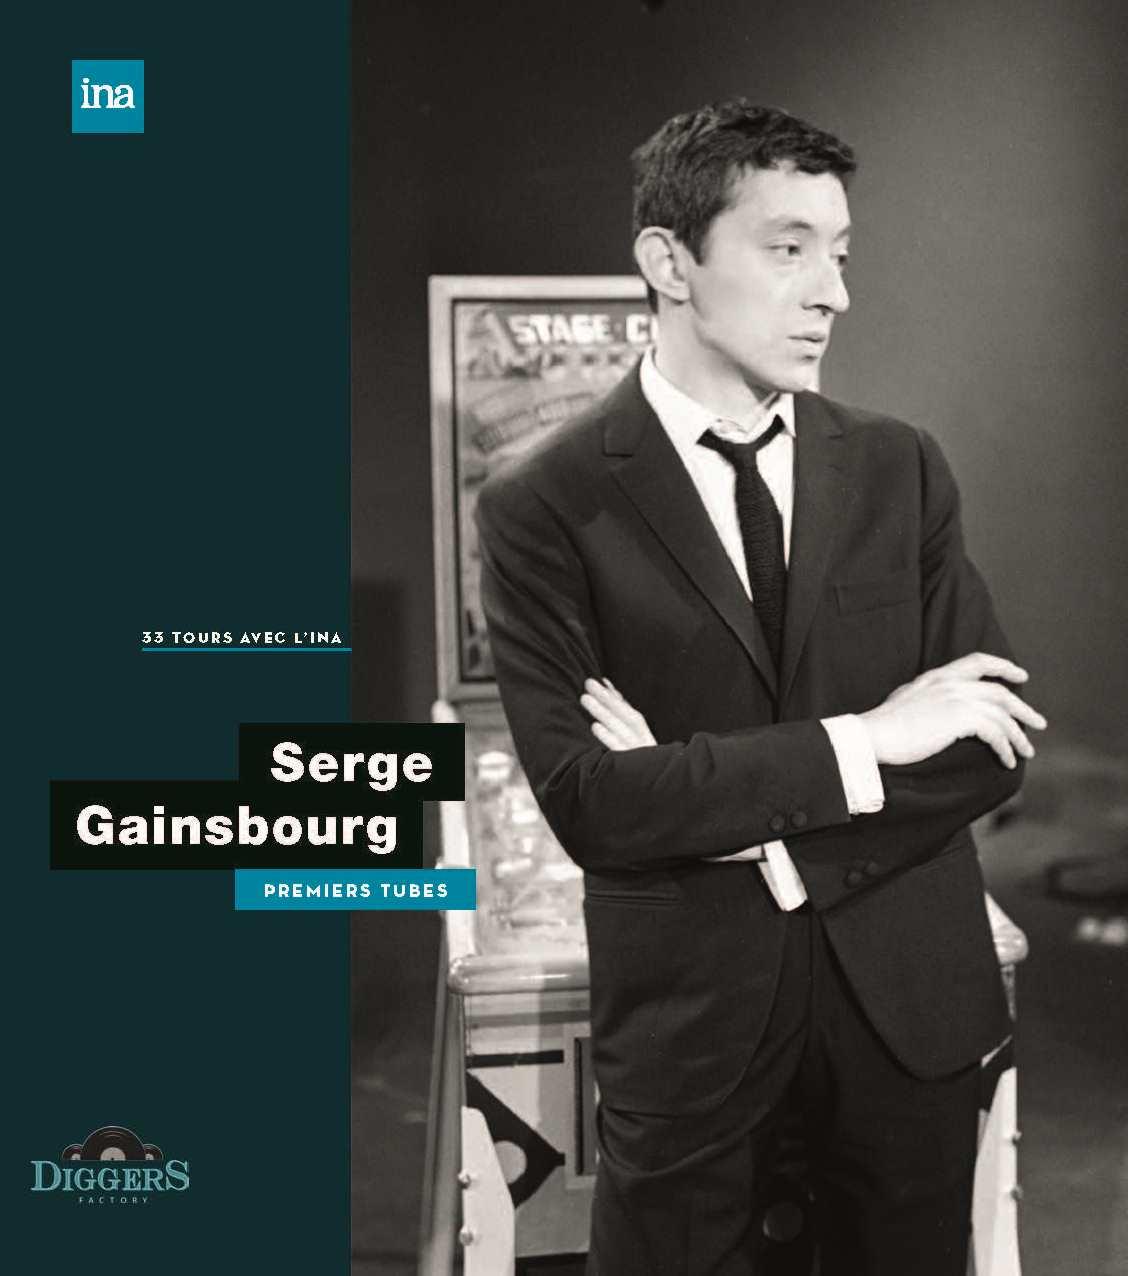 SergeGainsbourg-pochette_INA-Diggers.jpg